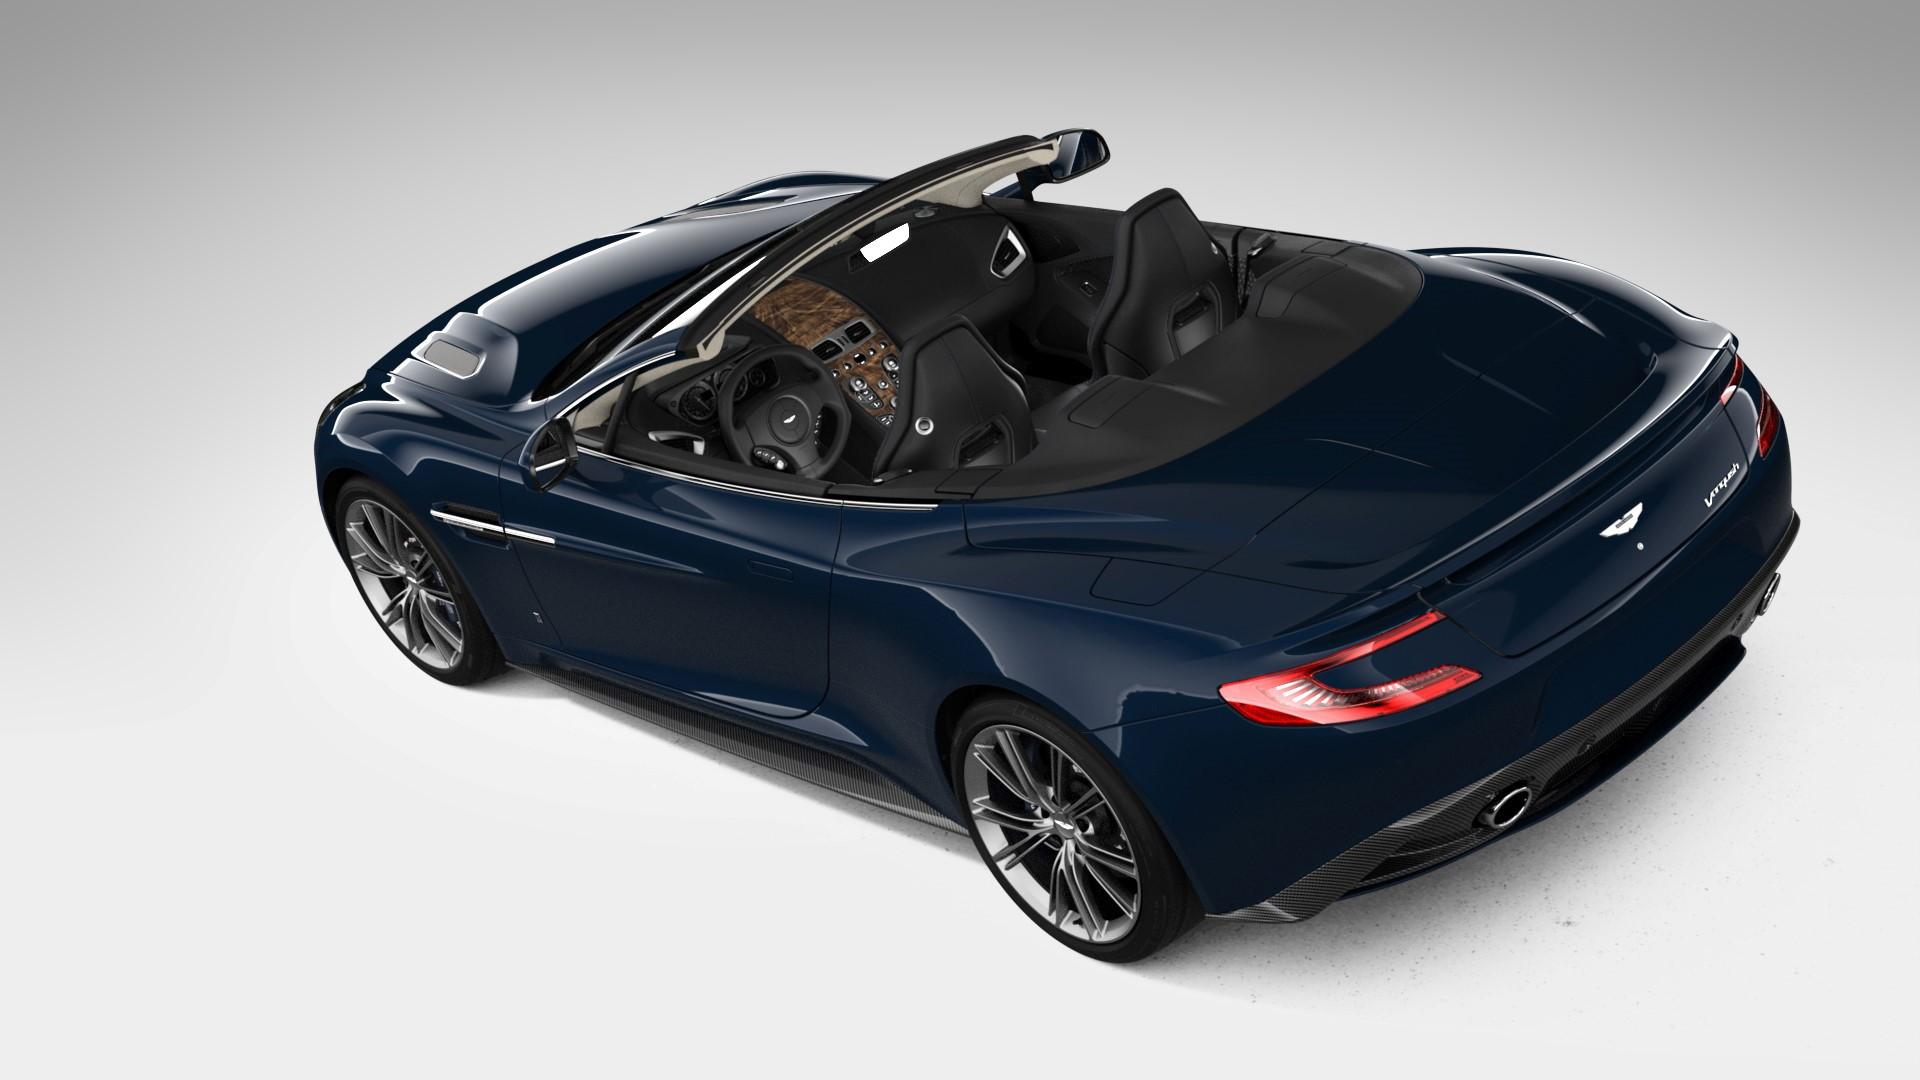 2014 Aston Martin Vanquish Volante Neiman Marcus Edition